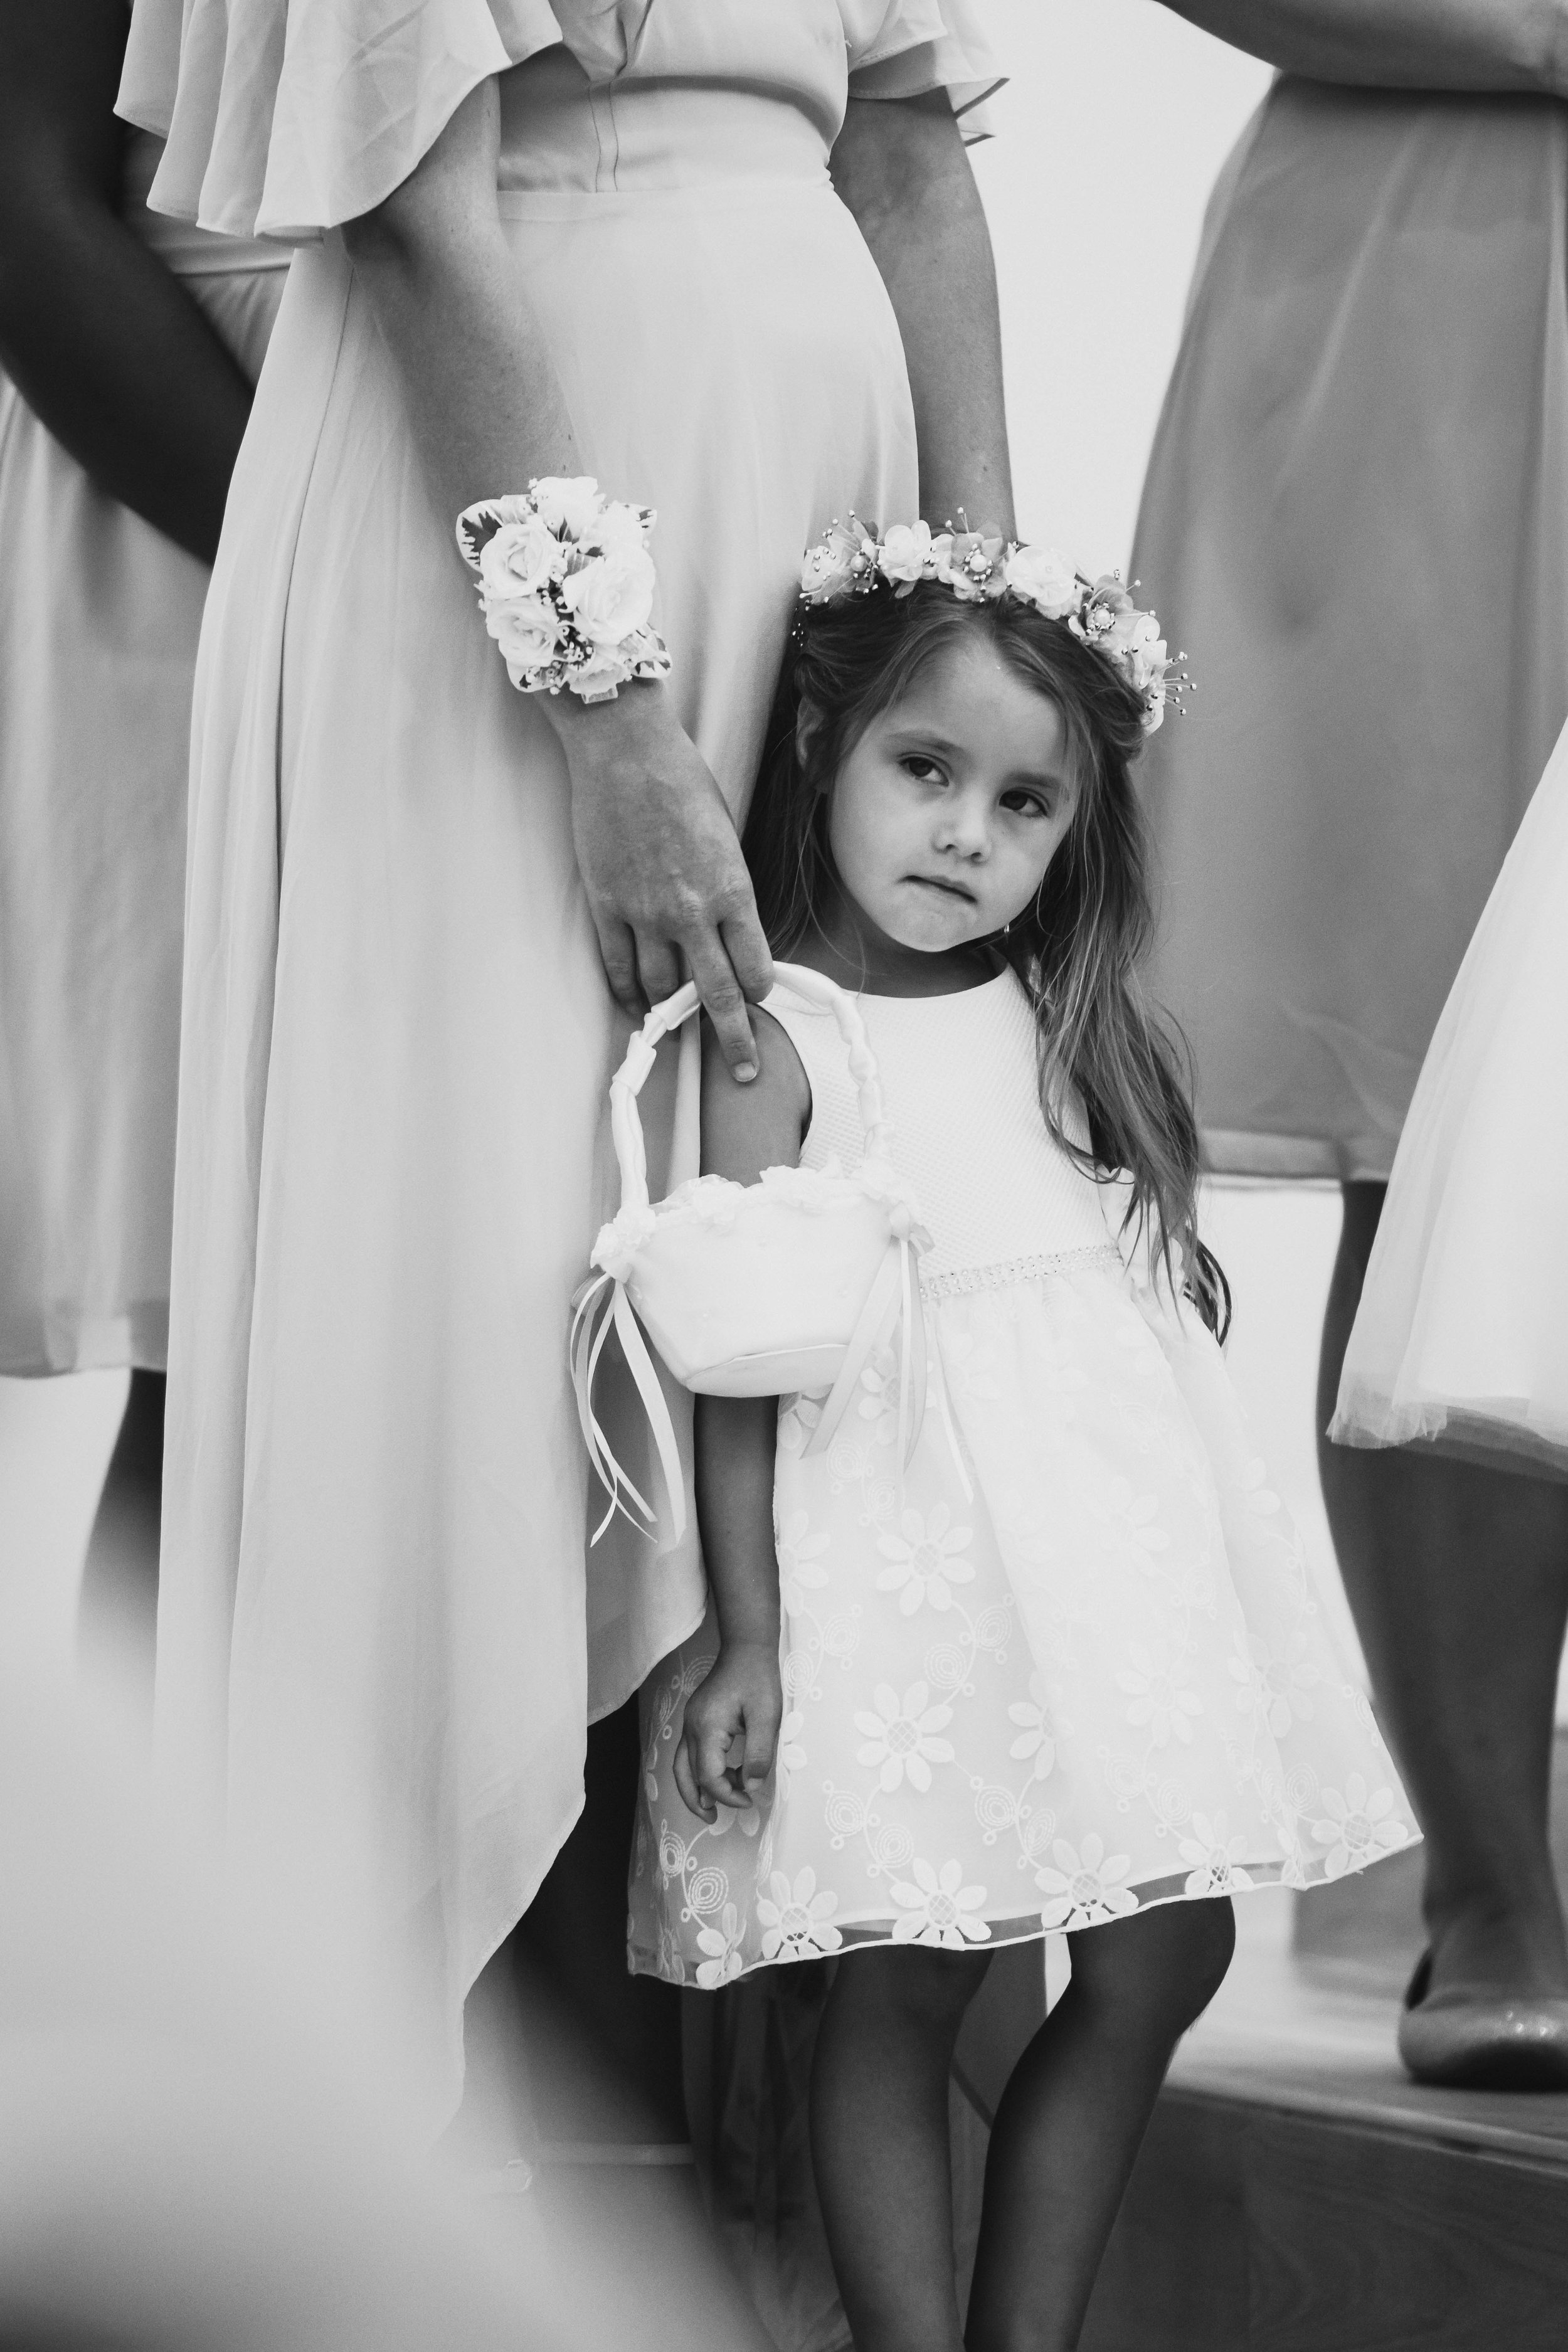 McNeile_Photography_Wedding_Tampa35.jpg